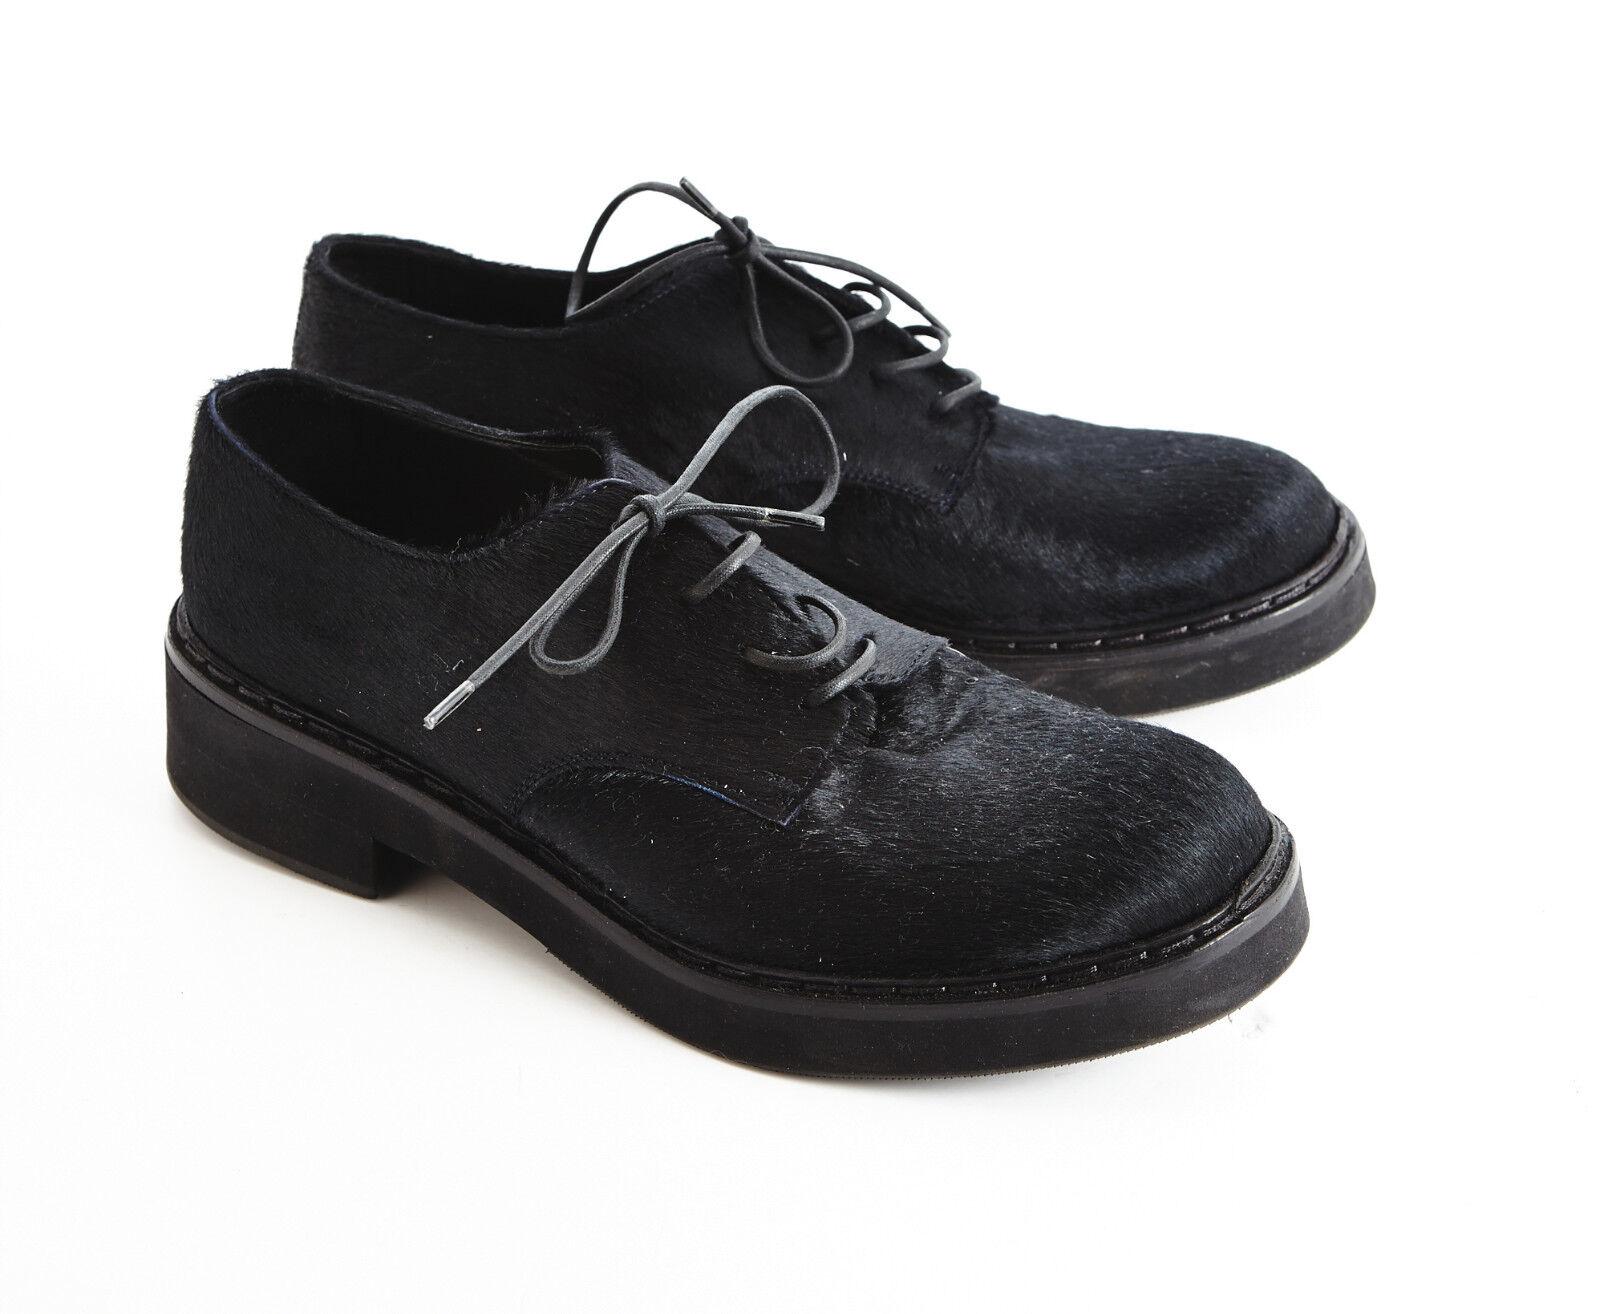 LAVORAZIONE ARTIGIANALE crin Oxford Chaussures Femmes Taille 9 m m m EU39 4da780